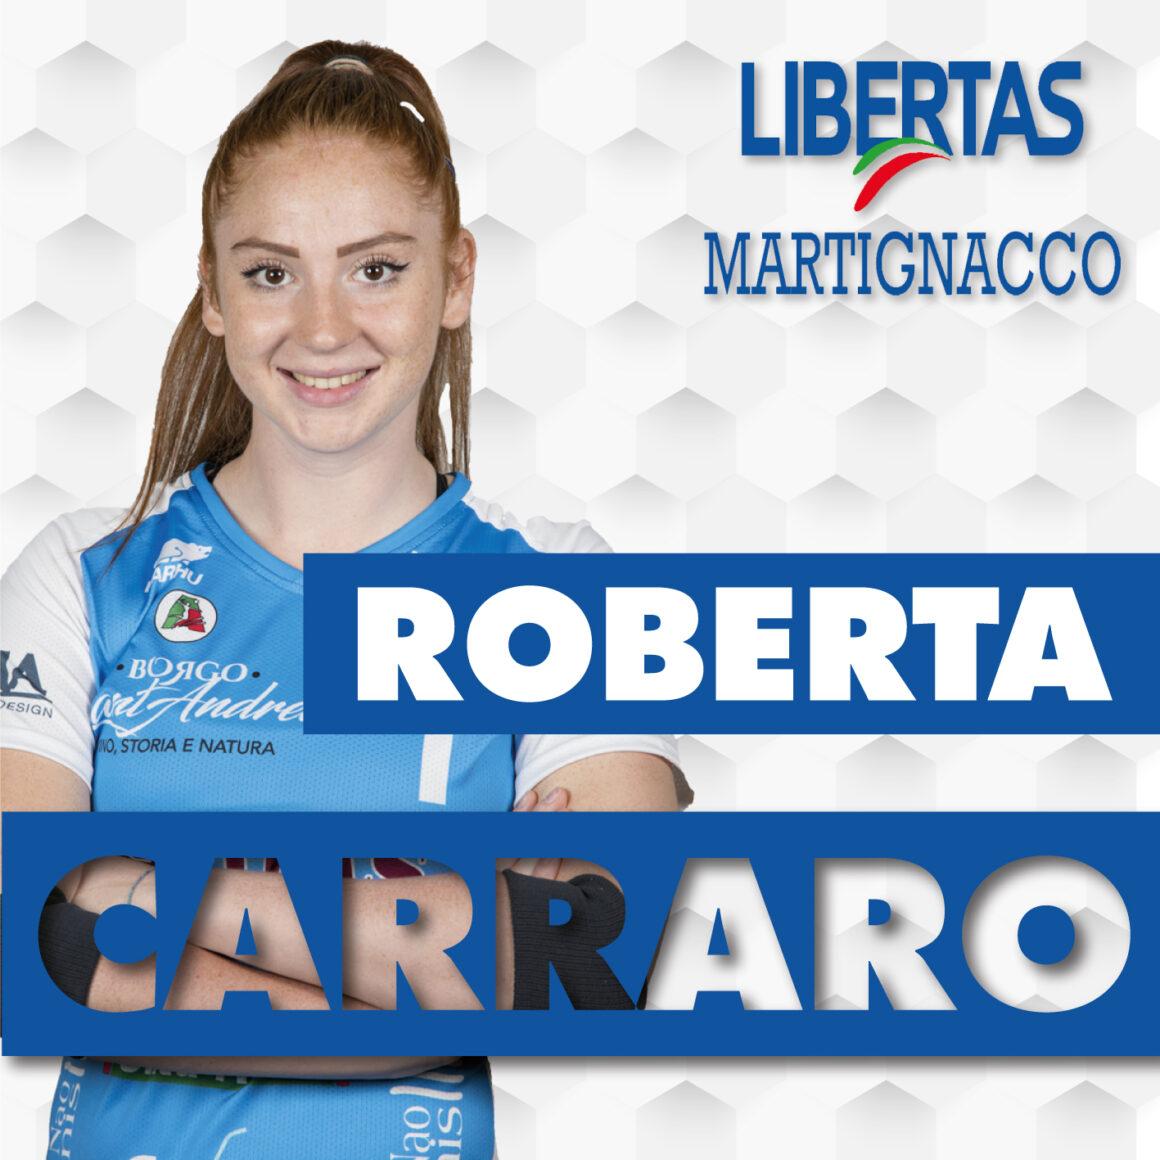 Nella Libertas 2021-22 ci sarà la regista Roberta Carraro